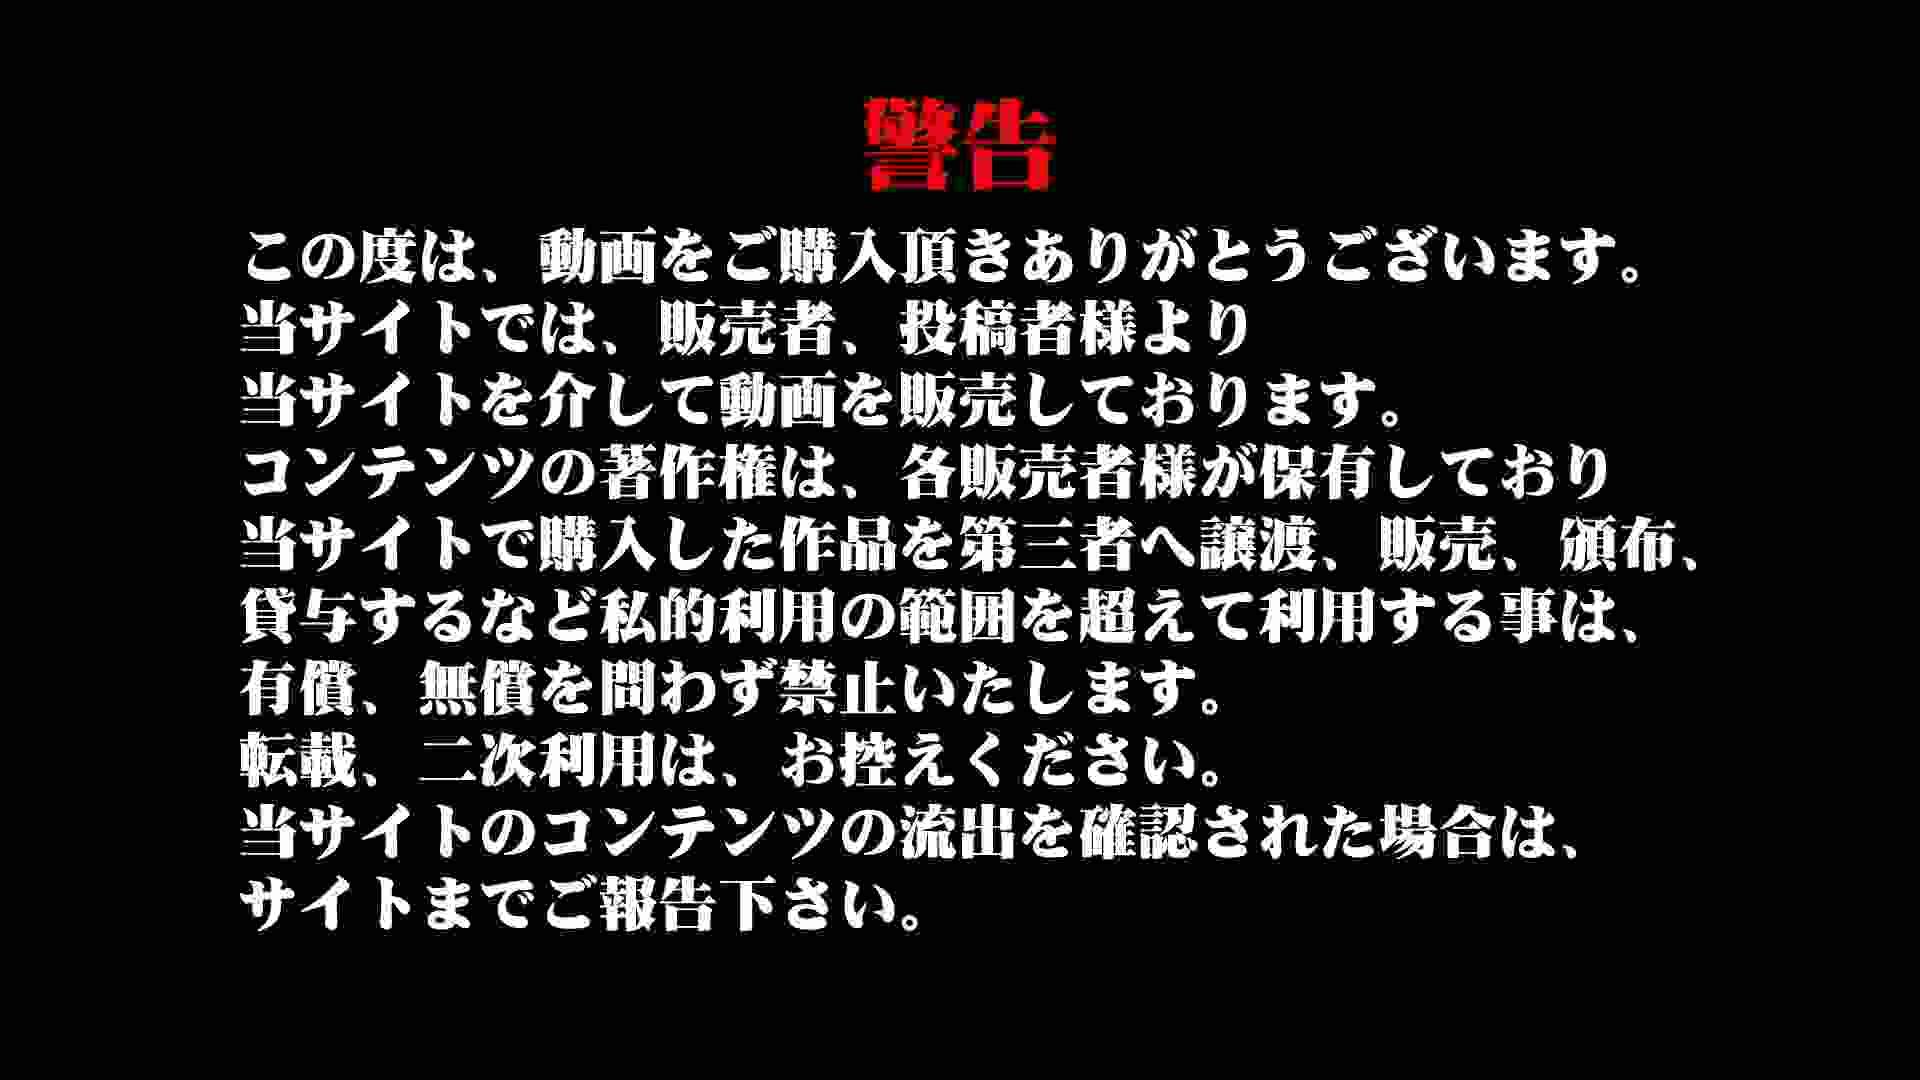 Aquaな露天風呂Vol.895 盗撮師作品  70pic 27